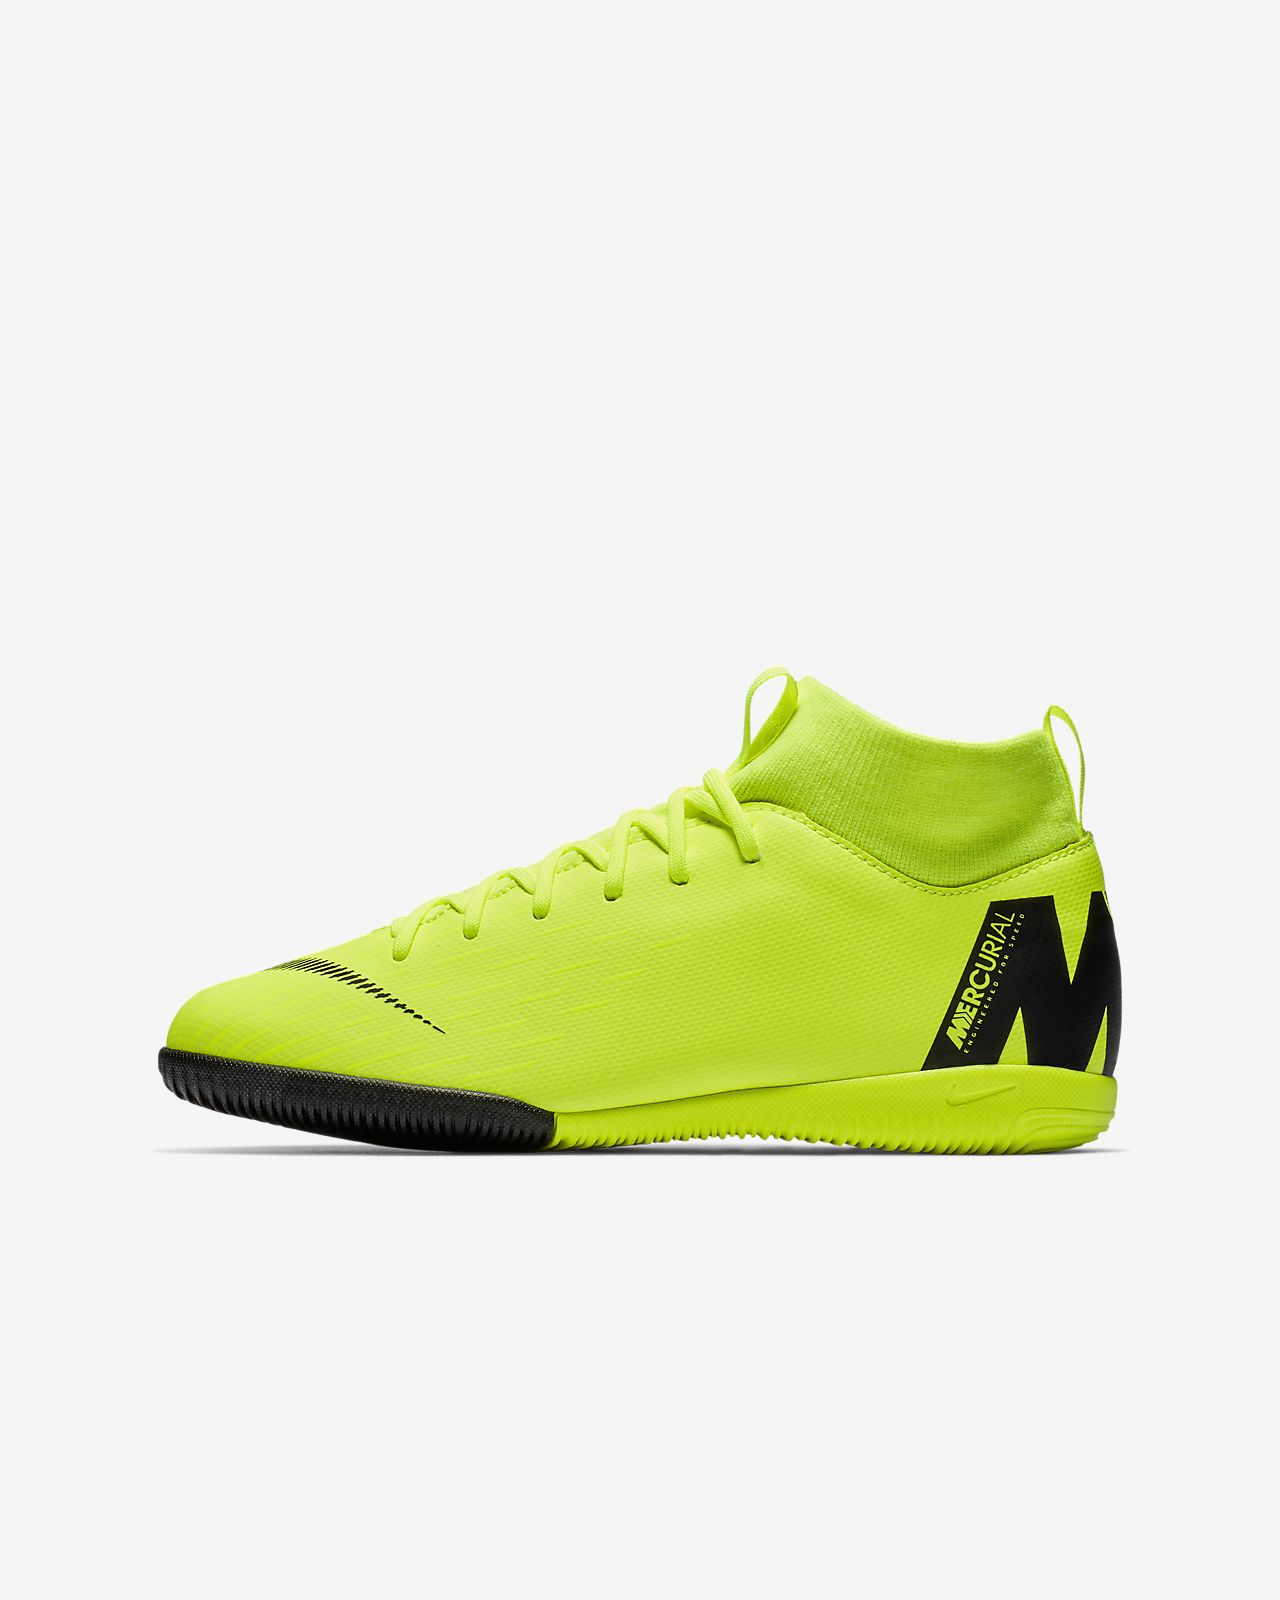 Nike Jr. SuperflyX 6 Academy IC Küçük/Genç Çocuk Kapalı Saha/Salon Kramponu